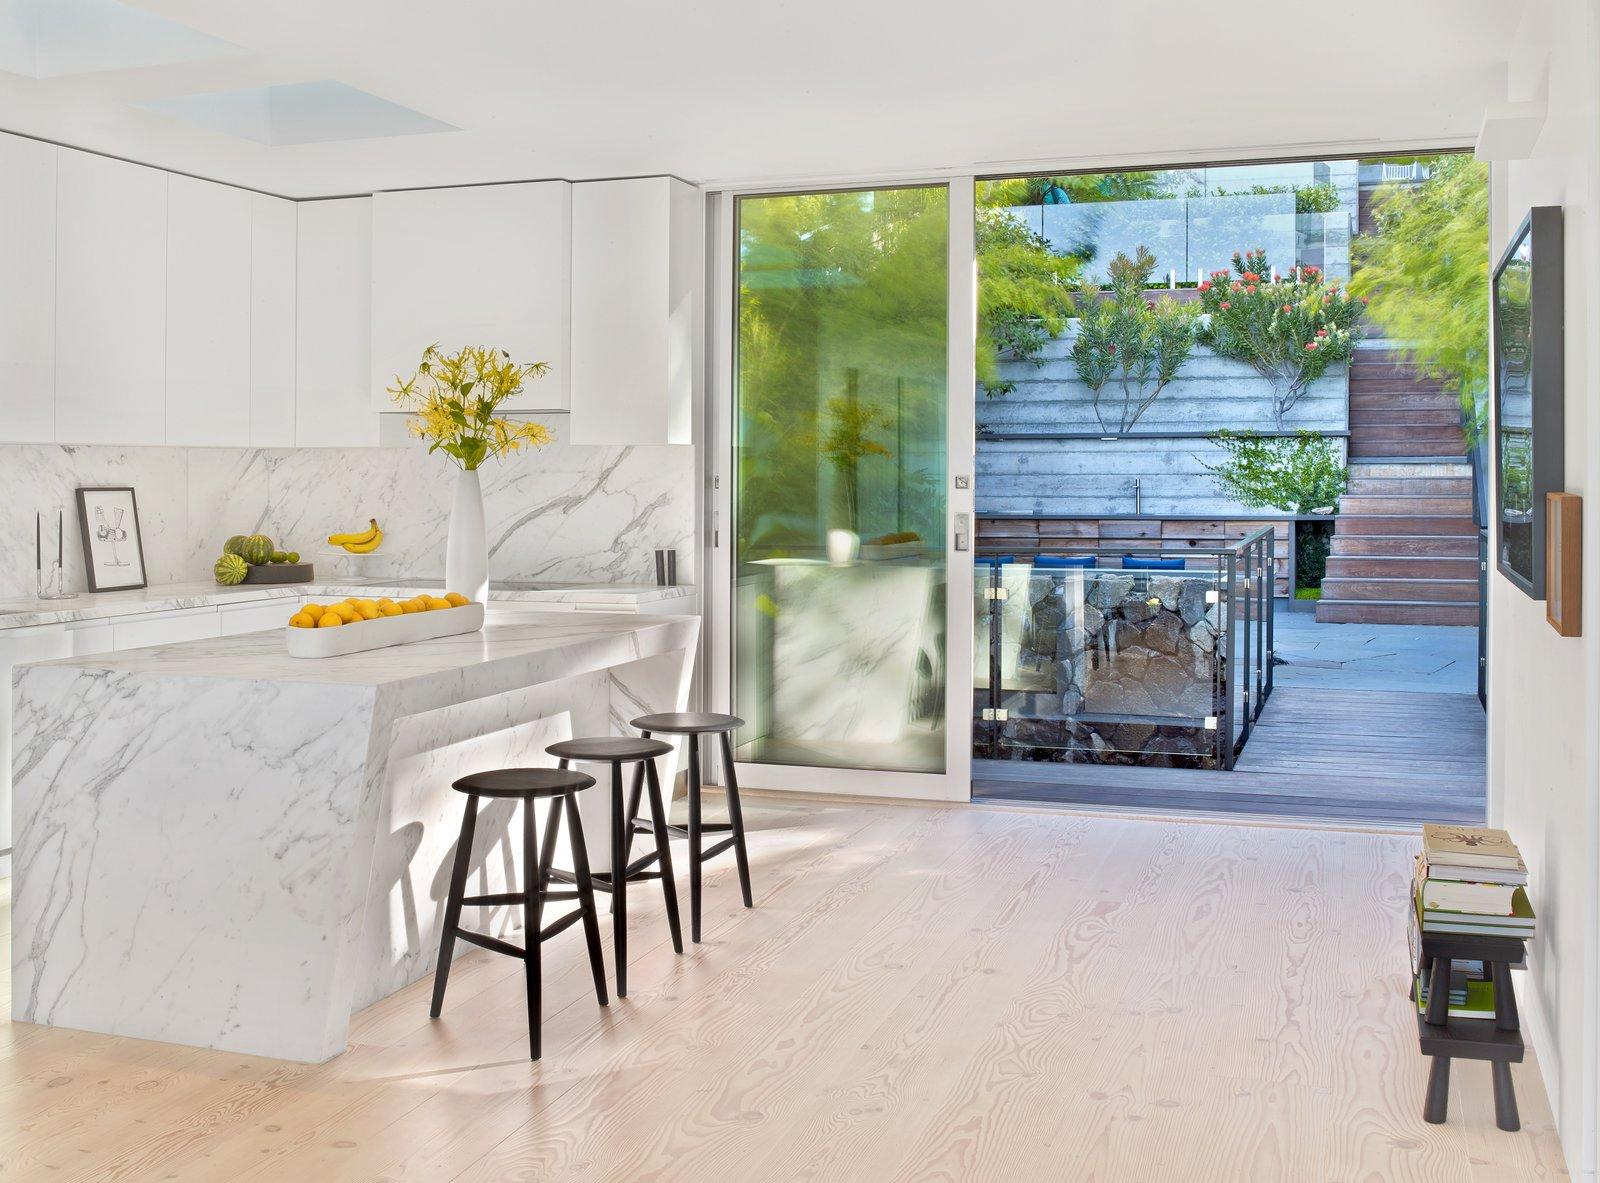 Kitchen, Marble Counter, White Cabinet, Light Hardwood Floor, Marble Backsplashe, and Ceiling Lighting  Glen Park Residence by CCS ARCHITECTURE